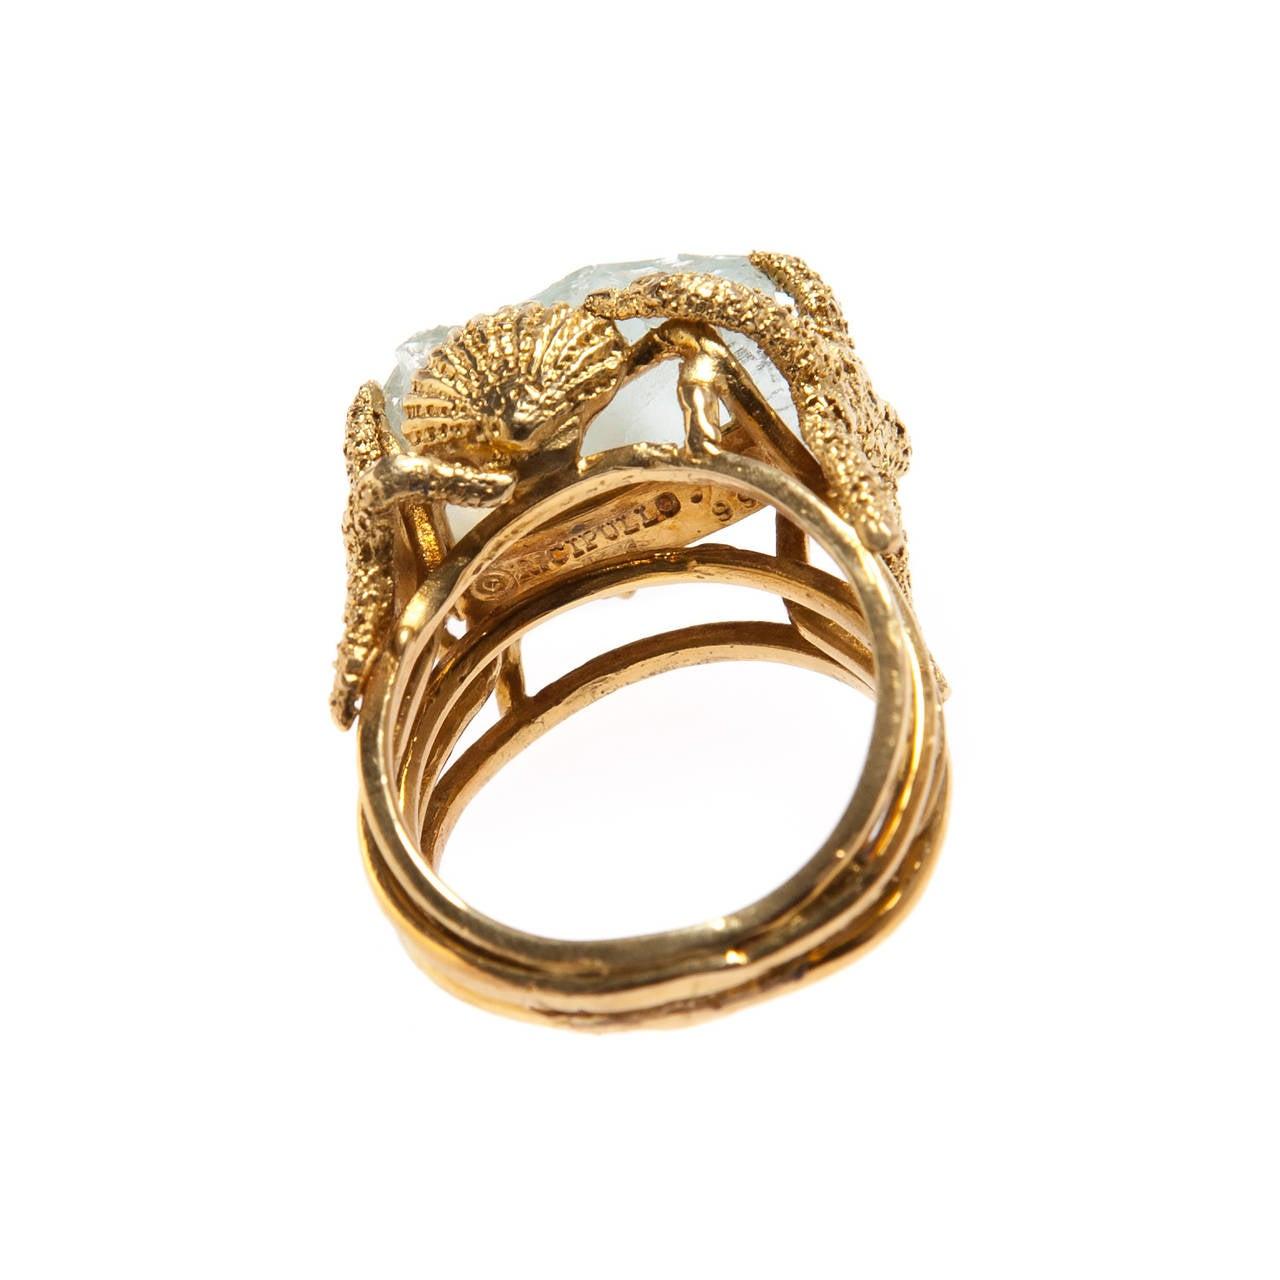 Whimsical Aquamarine Gold Ring 4